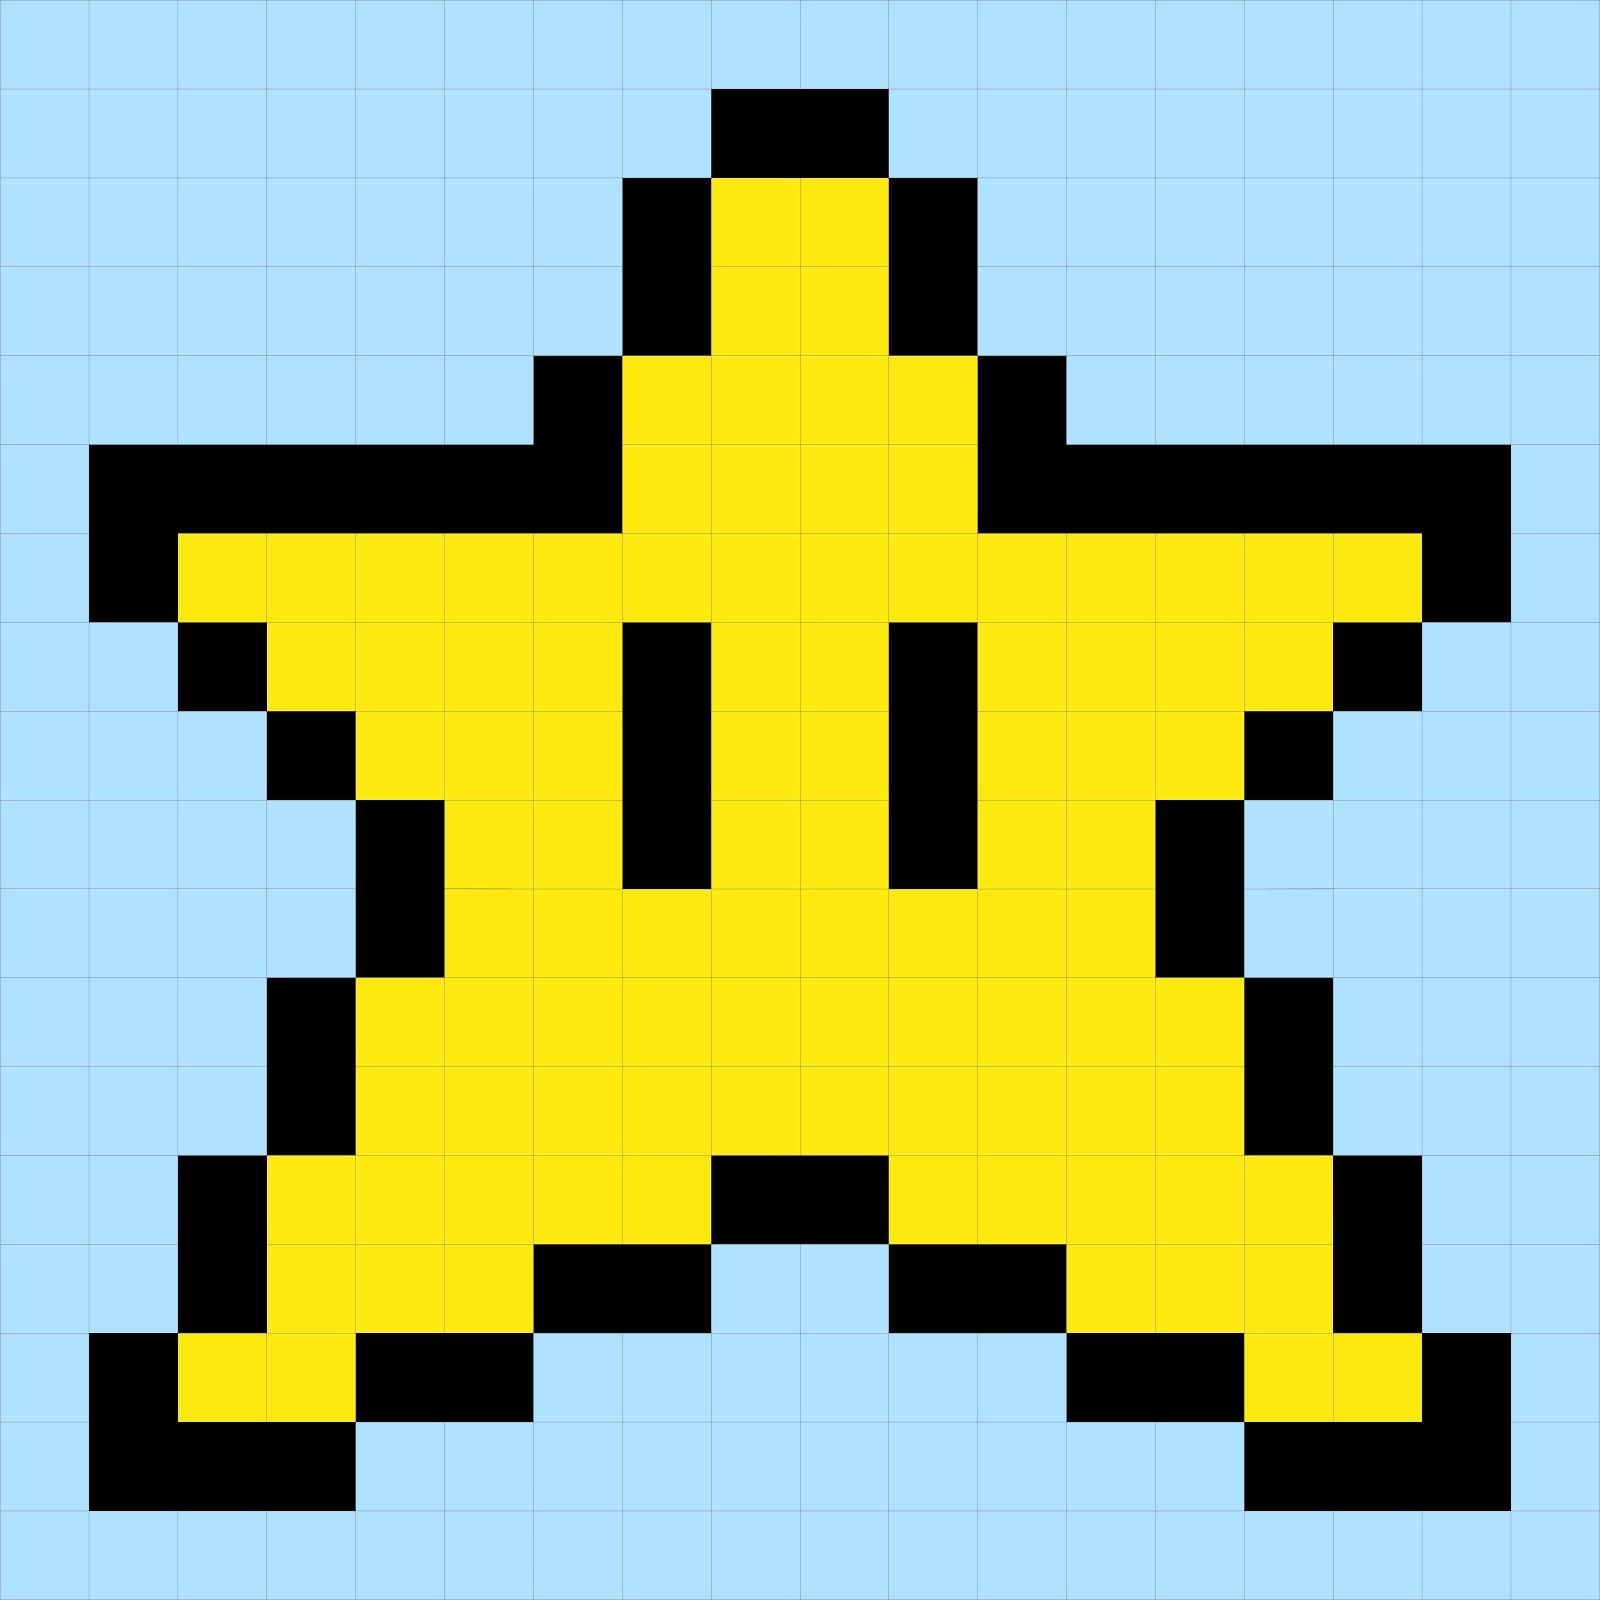 War thunder game assets pixel art grid